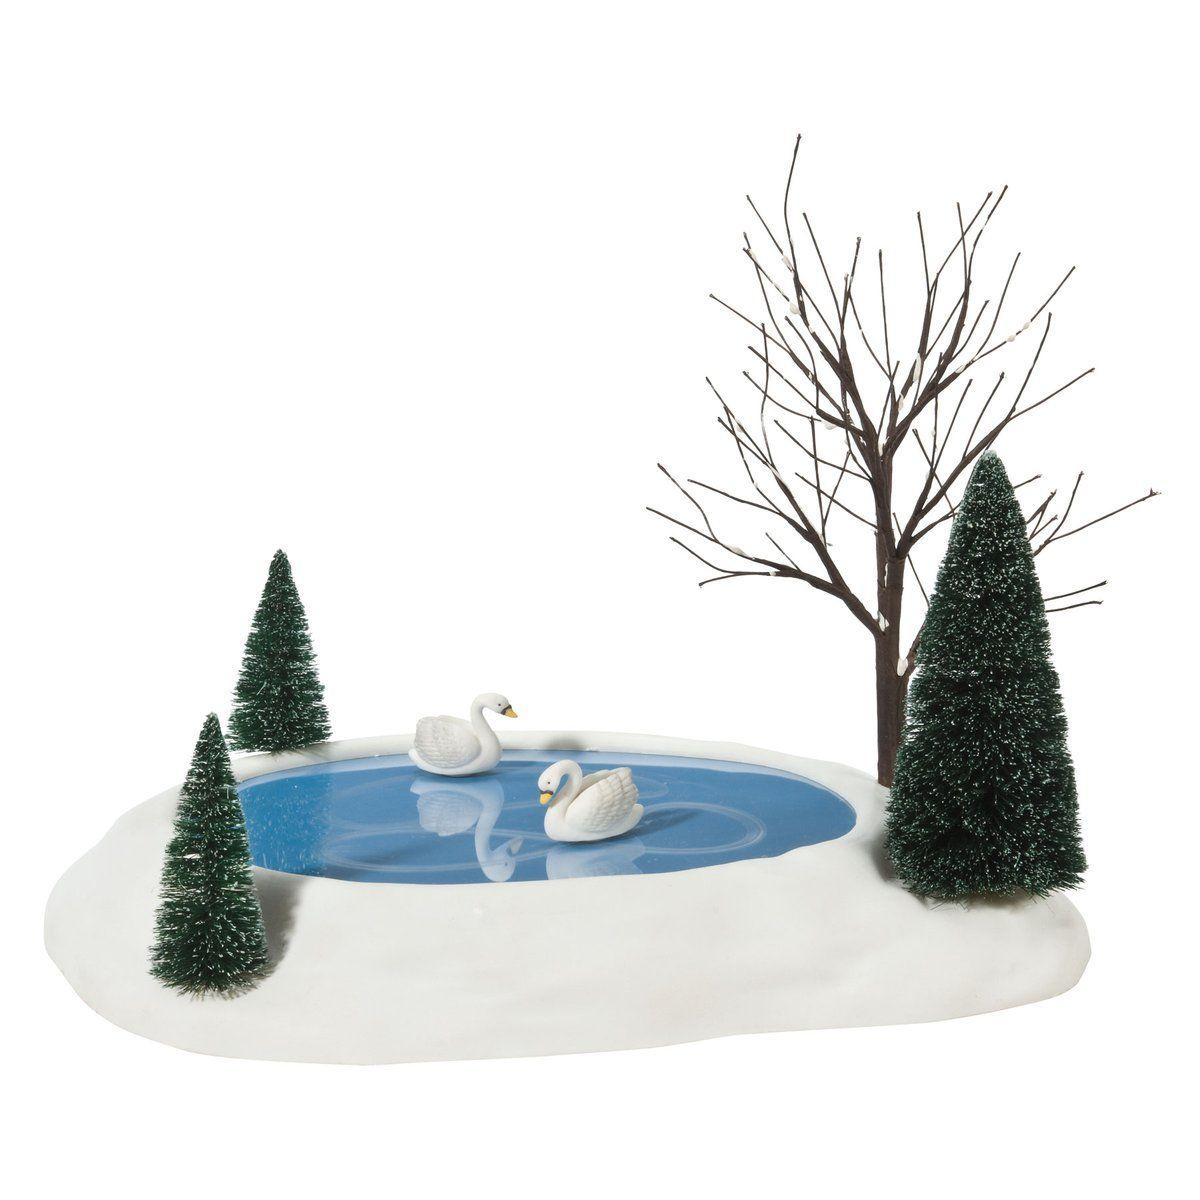 Animated Swan Pond Snow Village Christmas Figurines Christmas Village